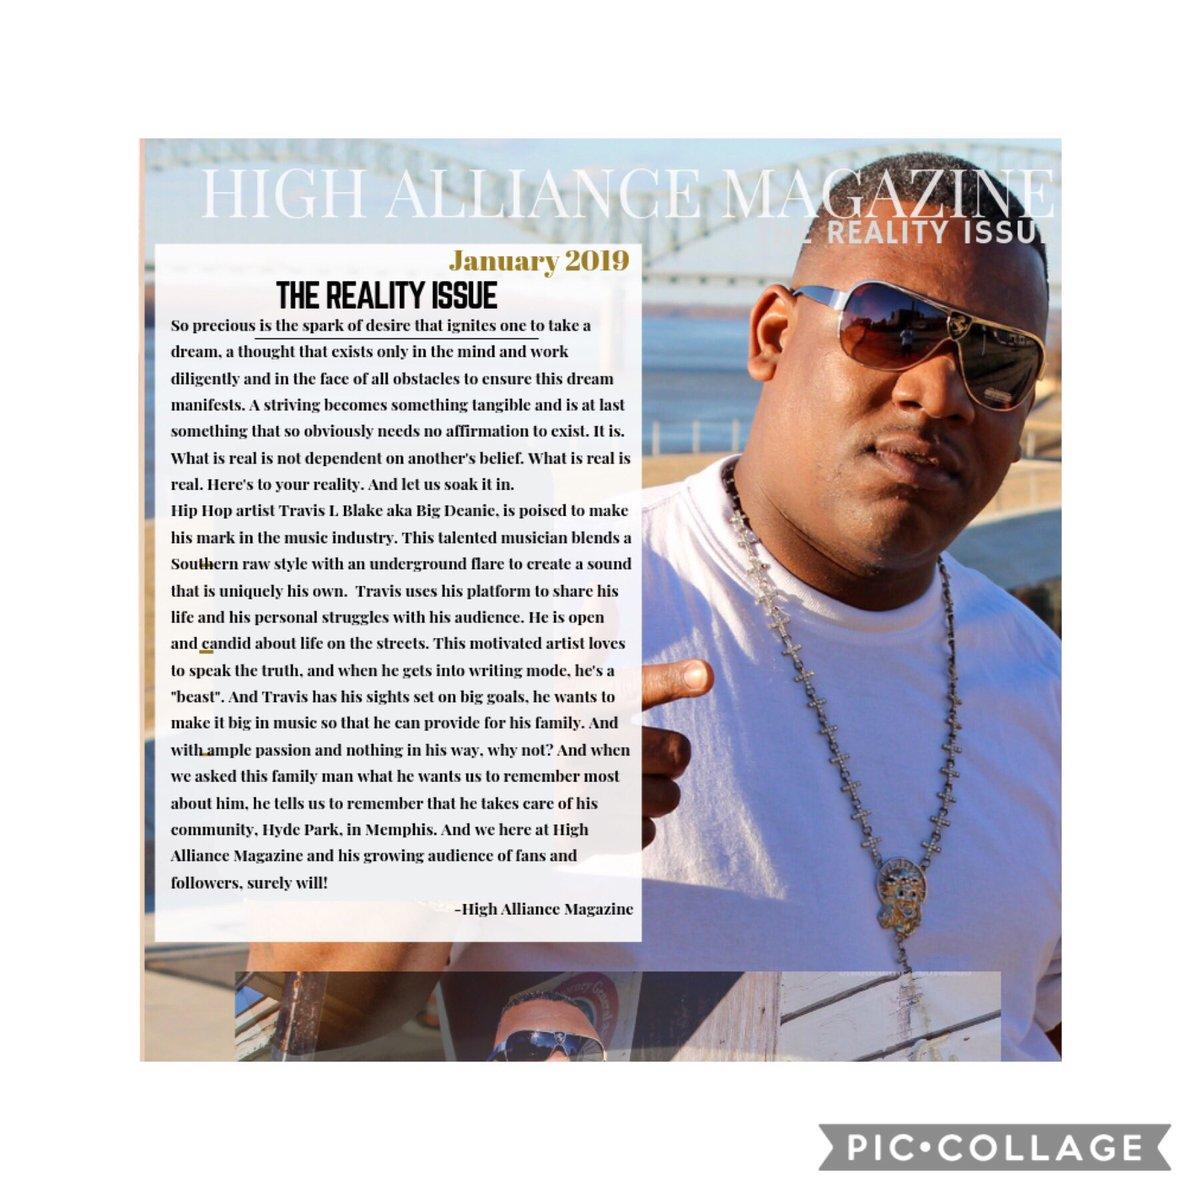 Memphis artist @flossthadean article in @highalliancemagazine #macwoodmemphis #IndieSpeaks #IndieNation #Blog #Indie #indieartist #music #newmusic #musicvideo #rap #hiphop #hiphopartist #rockband  #dj #newartist #songwriter #independentartist  #rapper #bigdeanie